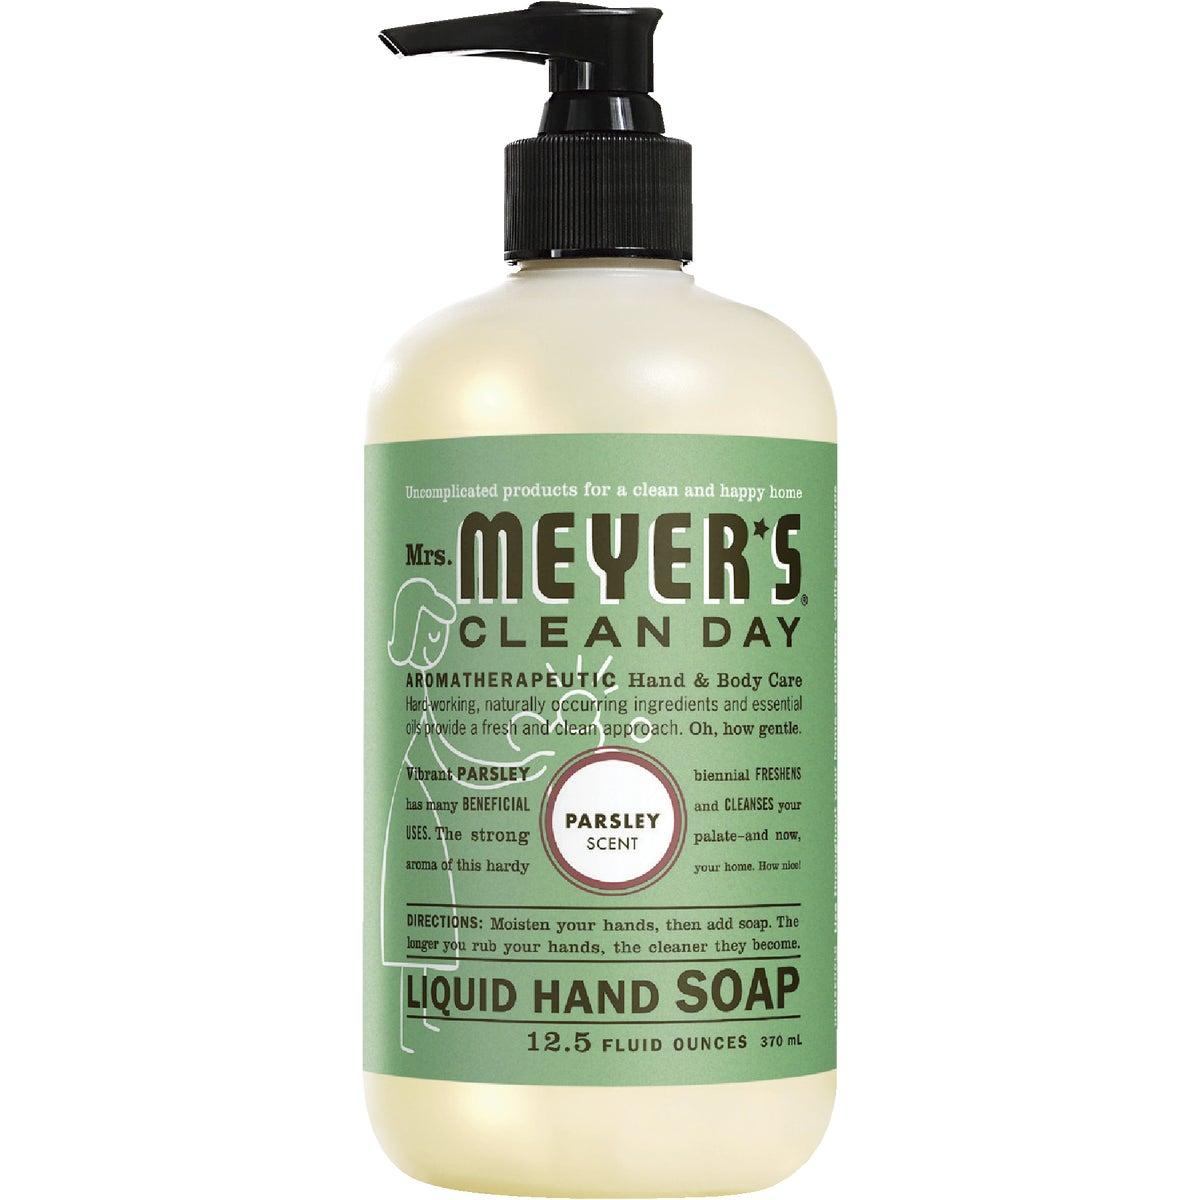 PARSLEY LIQUID HAND SOAP - 17446 by Sc Johnson